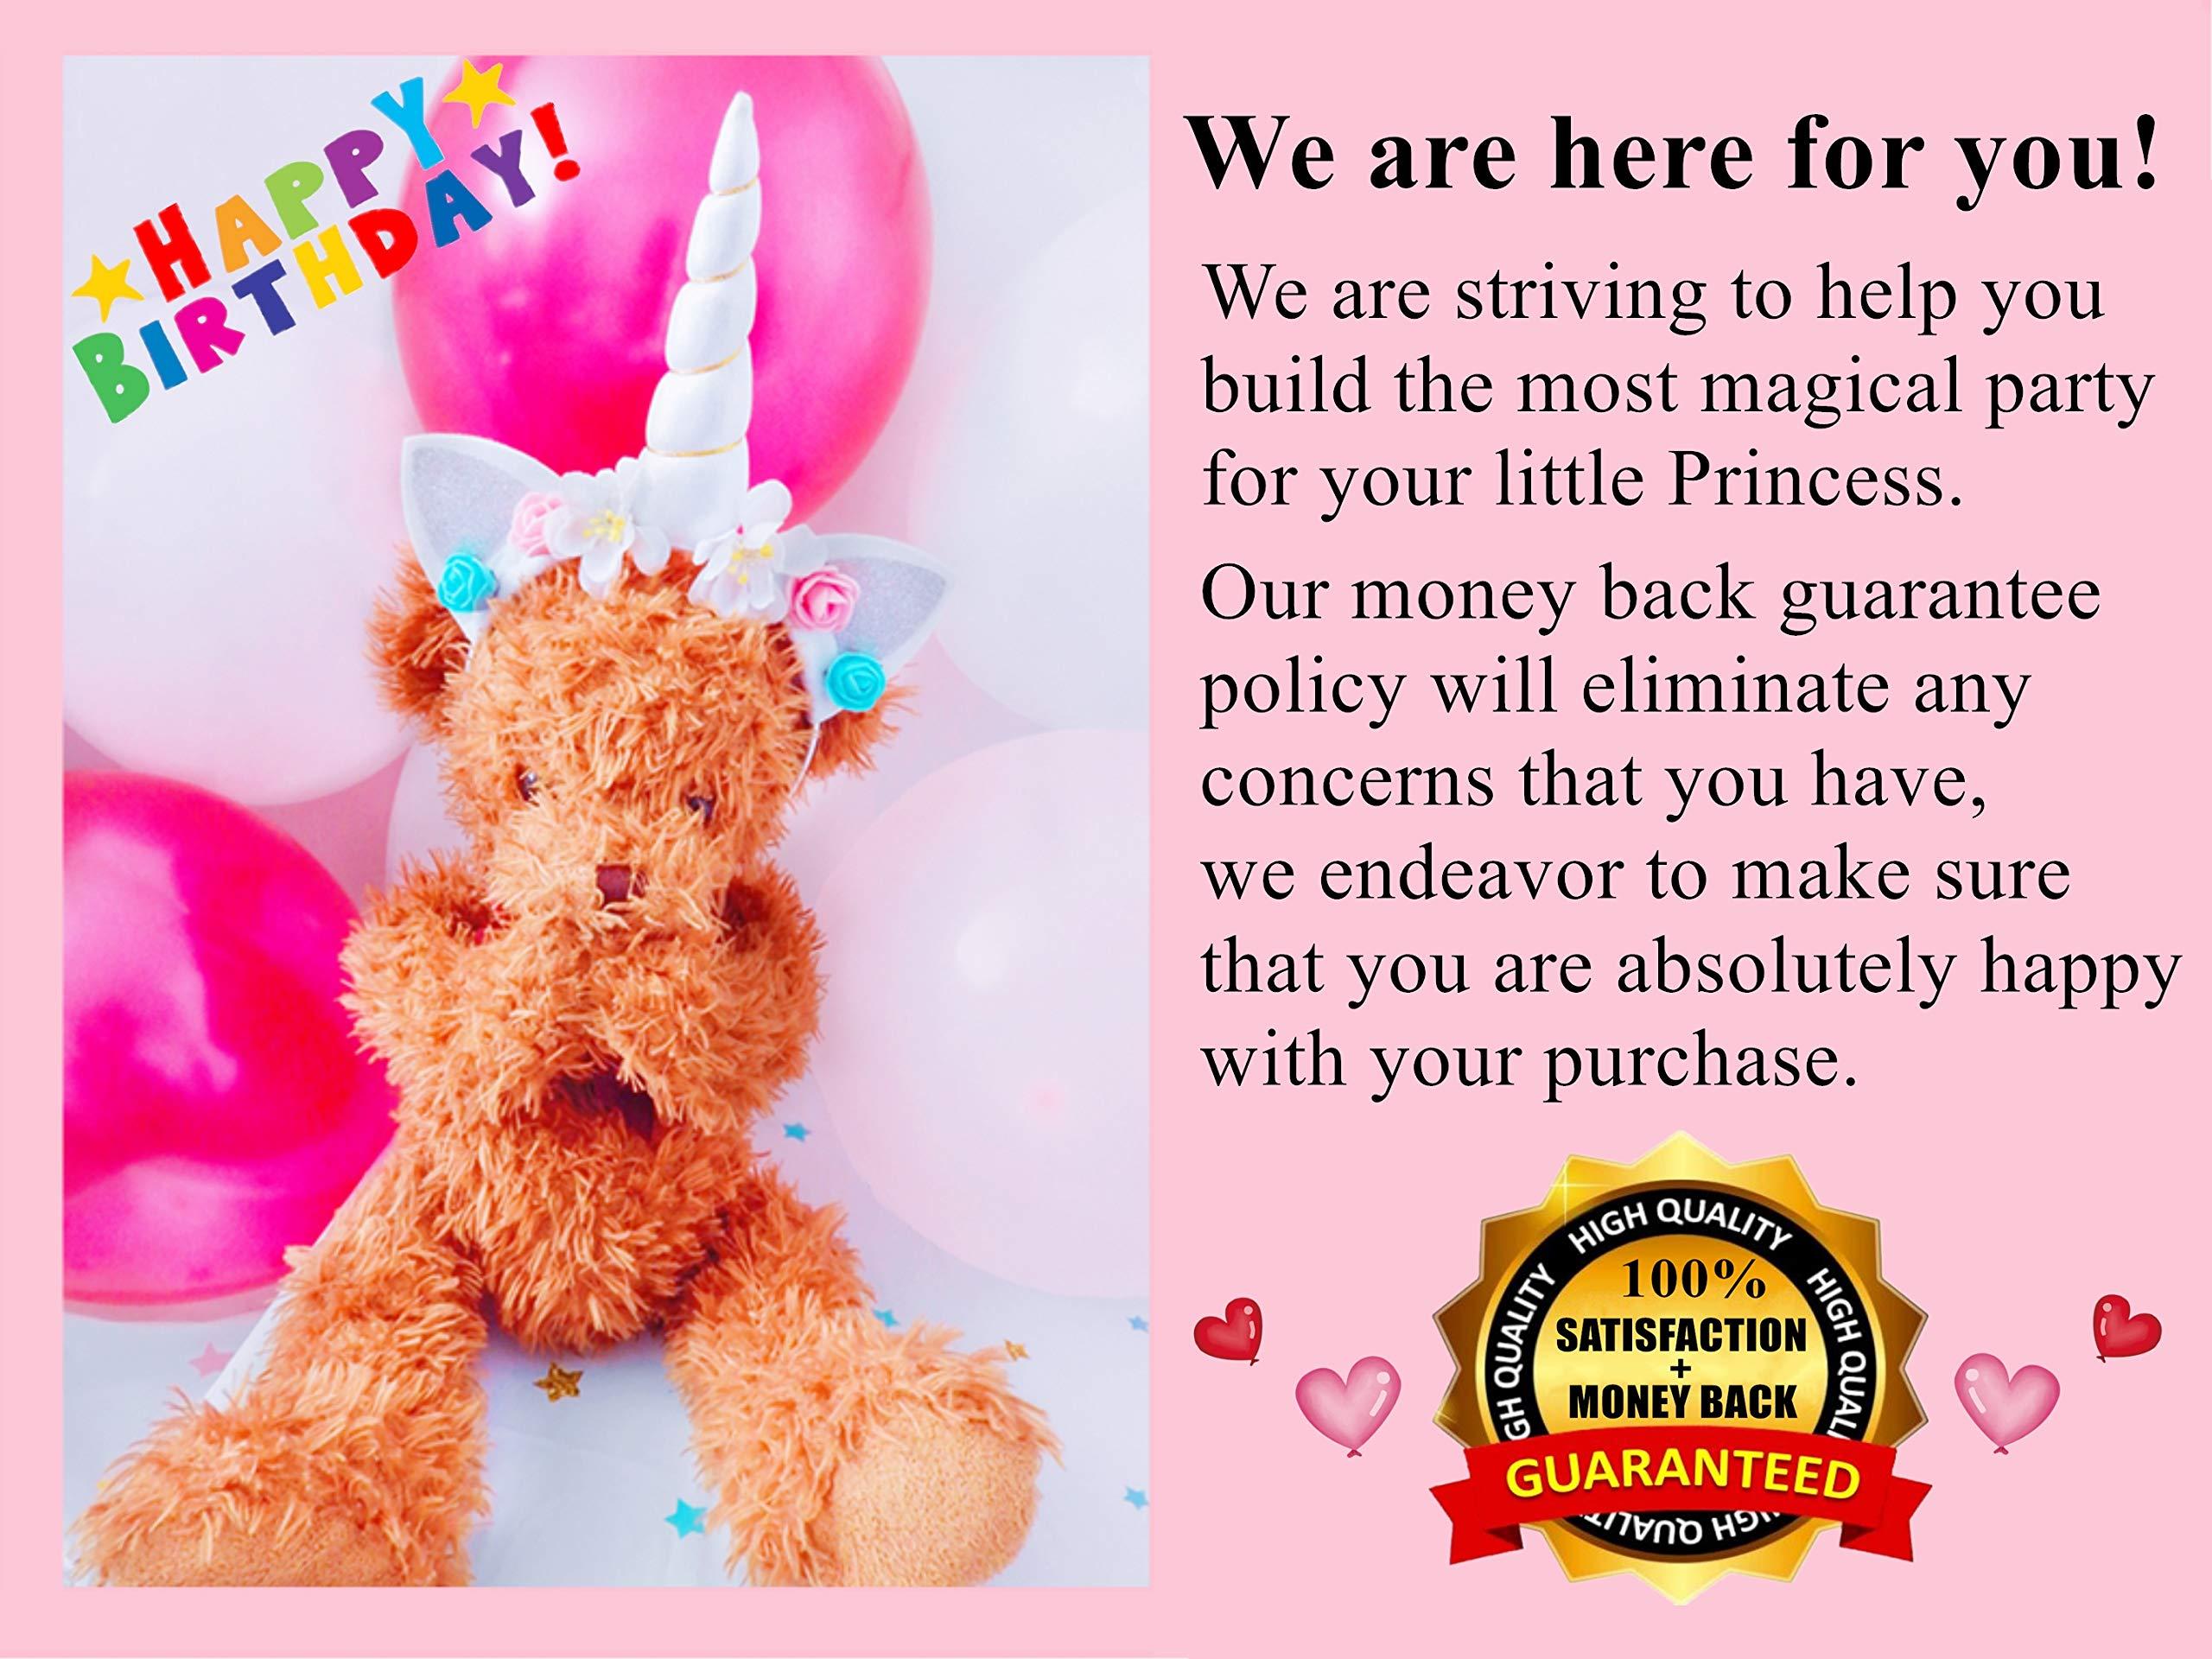 Unicorn Party Supplies Set with BONUS Glittery Unicorn Headband and 30 Balloons   145 Piece Disposable Unicorn Themed… 7